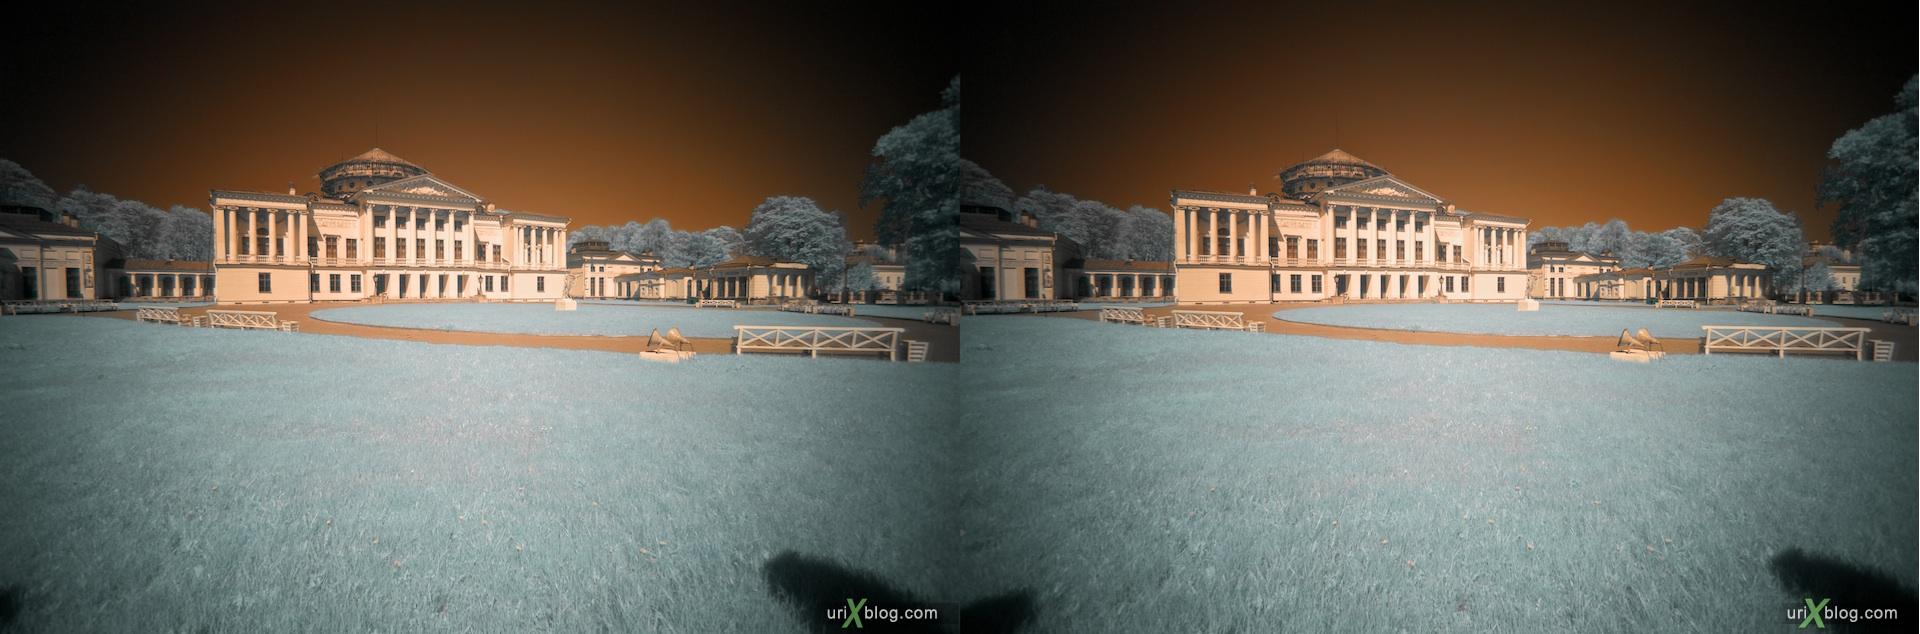 Ostankino park in infrared 3D, stereo, cross-eyed, стерео, стереопара, инфракрасный парк Останкино, Hoya R72 Москва 2010